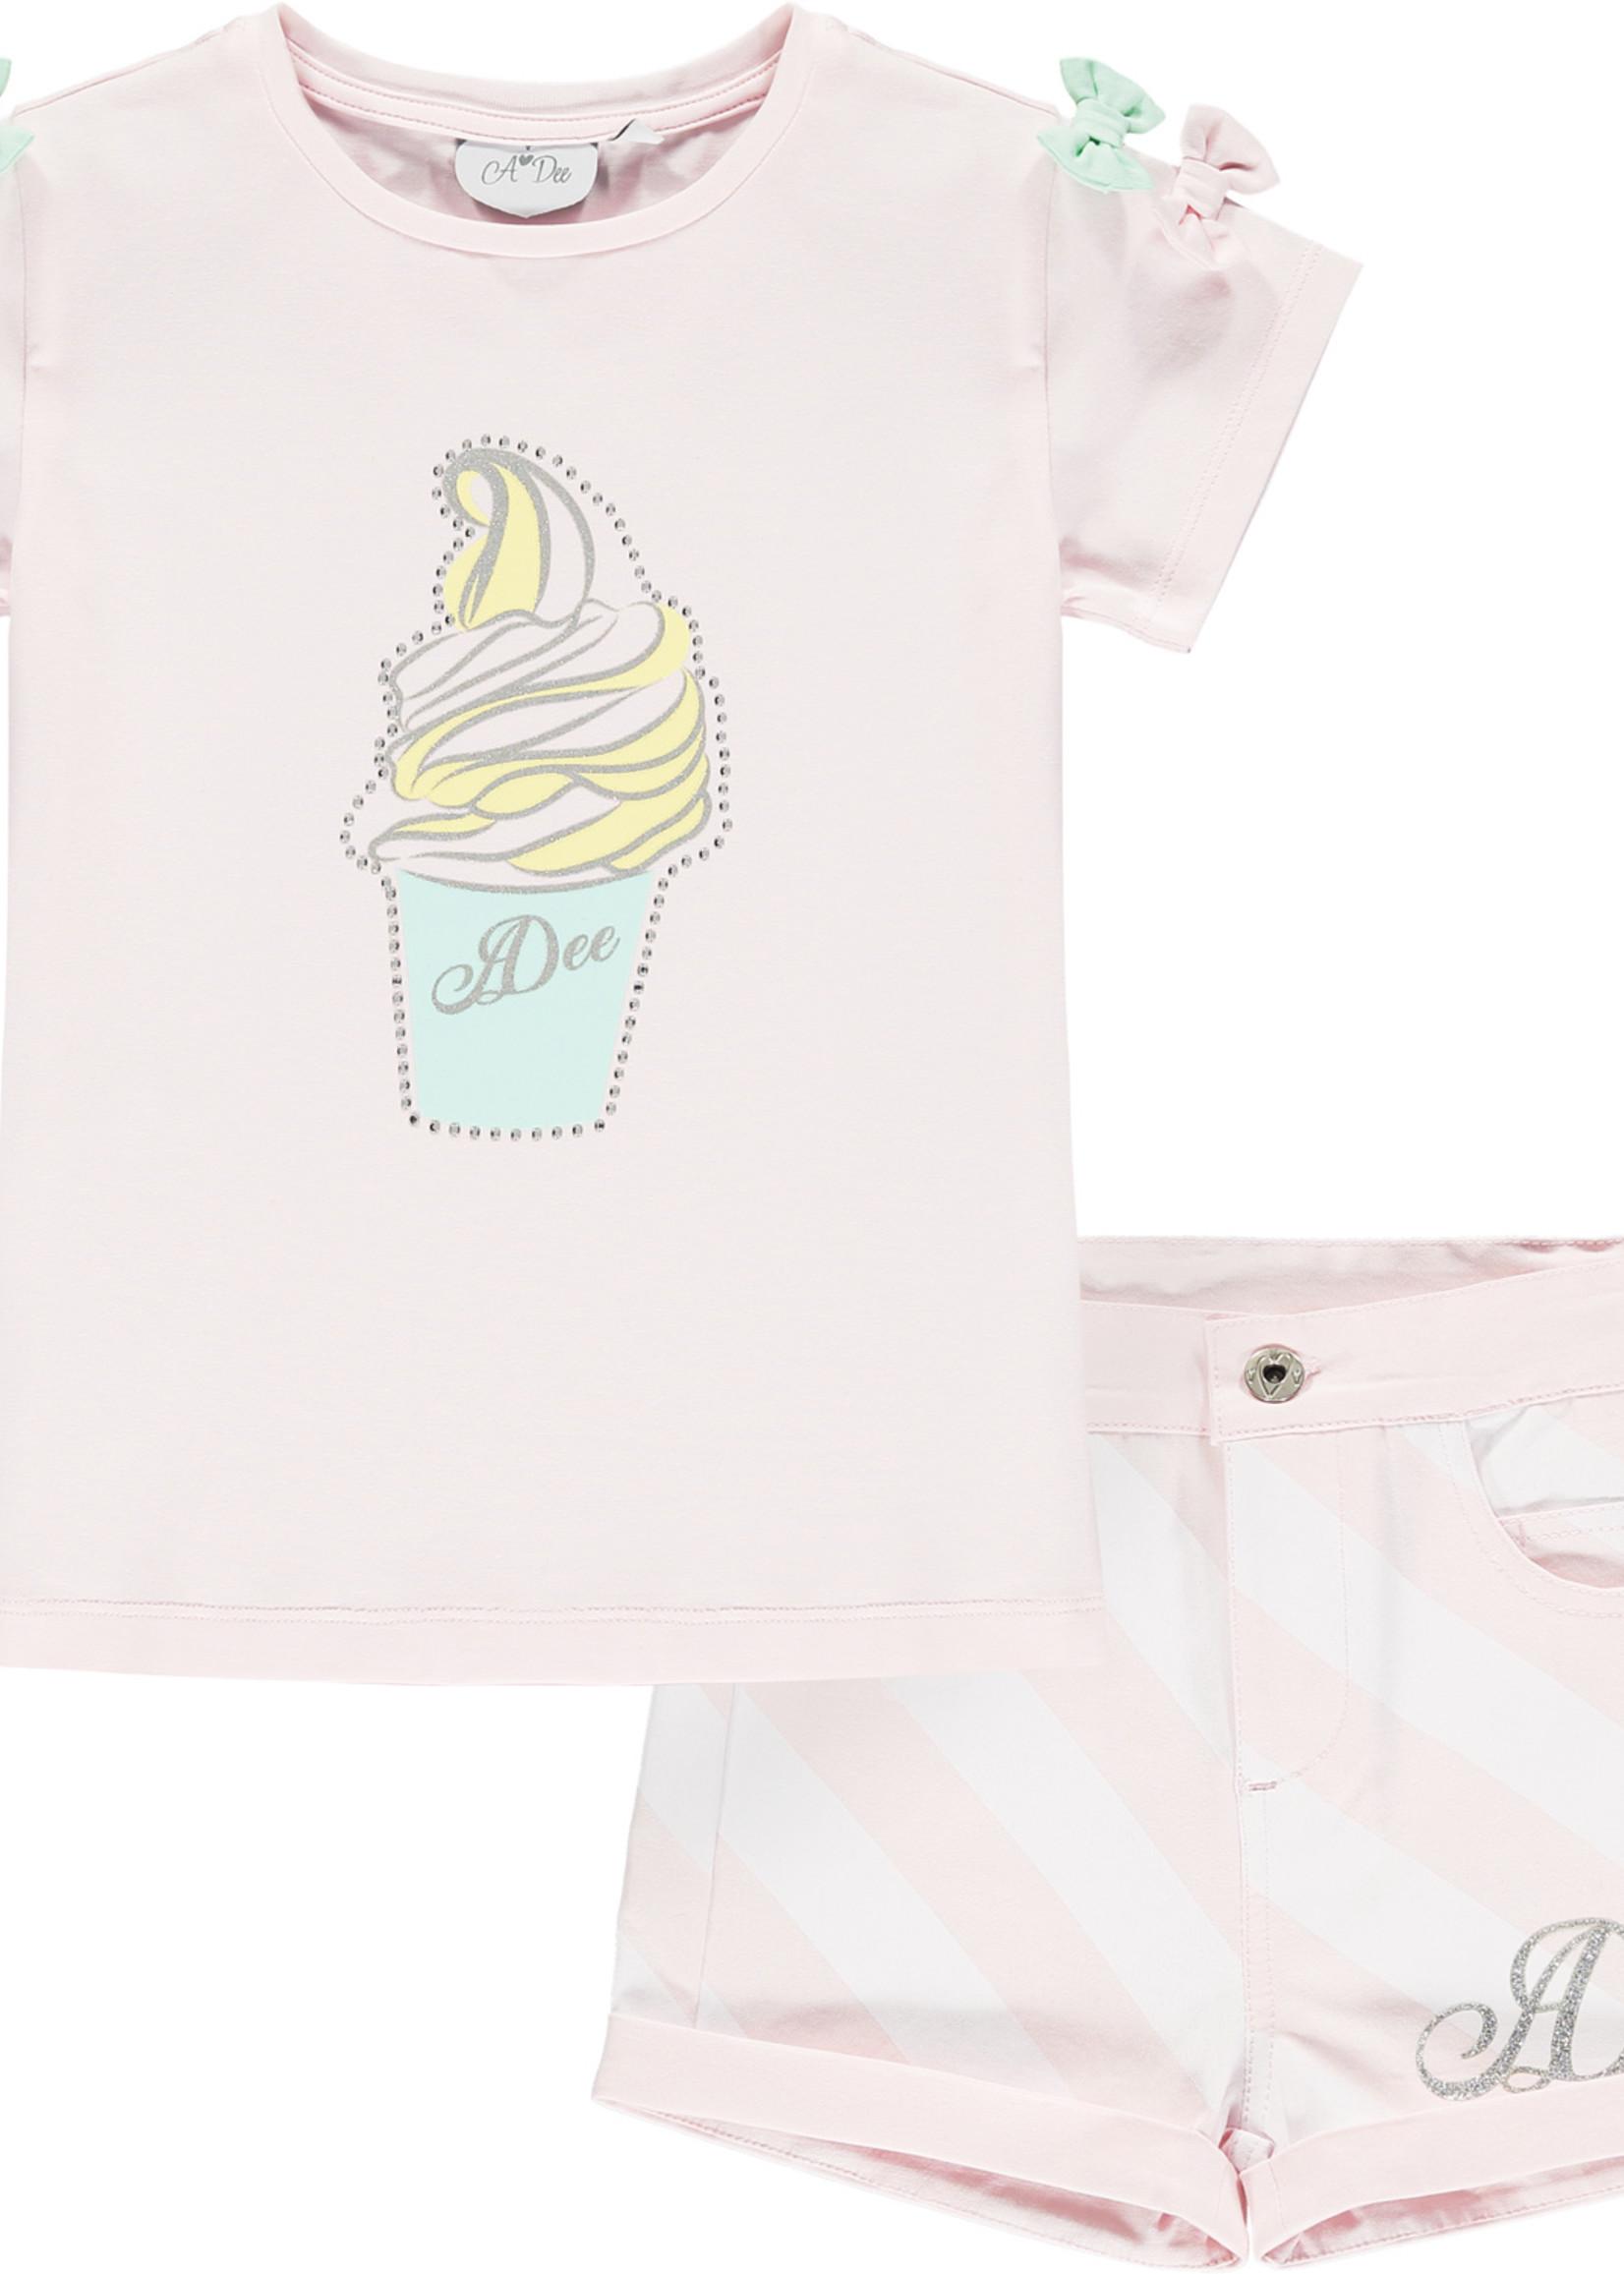 A Dee Olga ice cream jersey t shirt